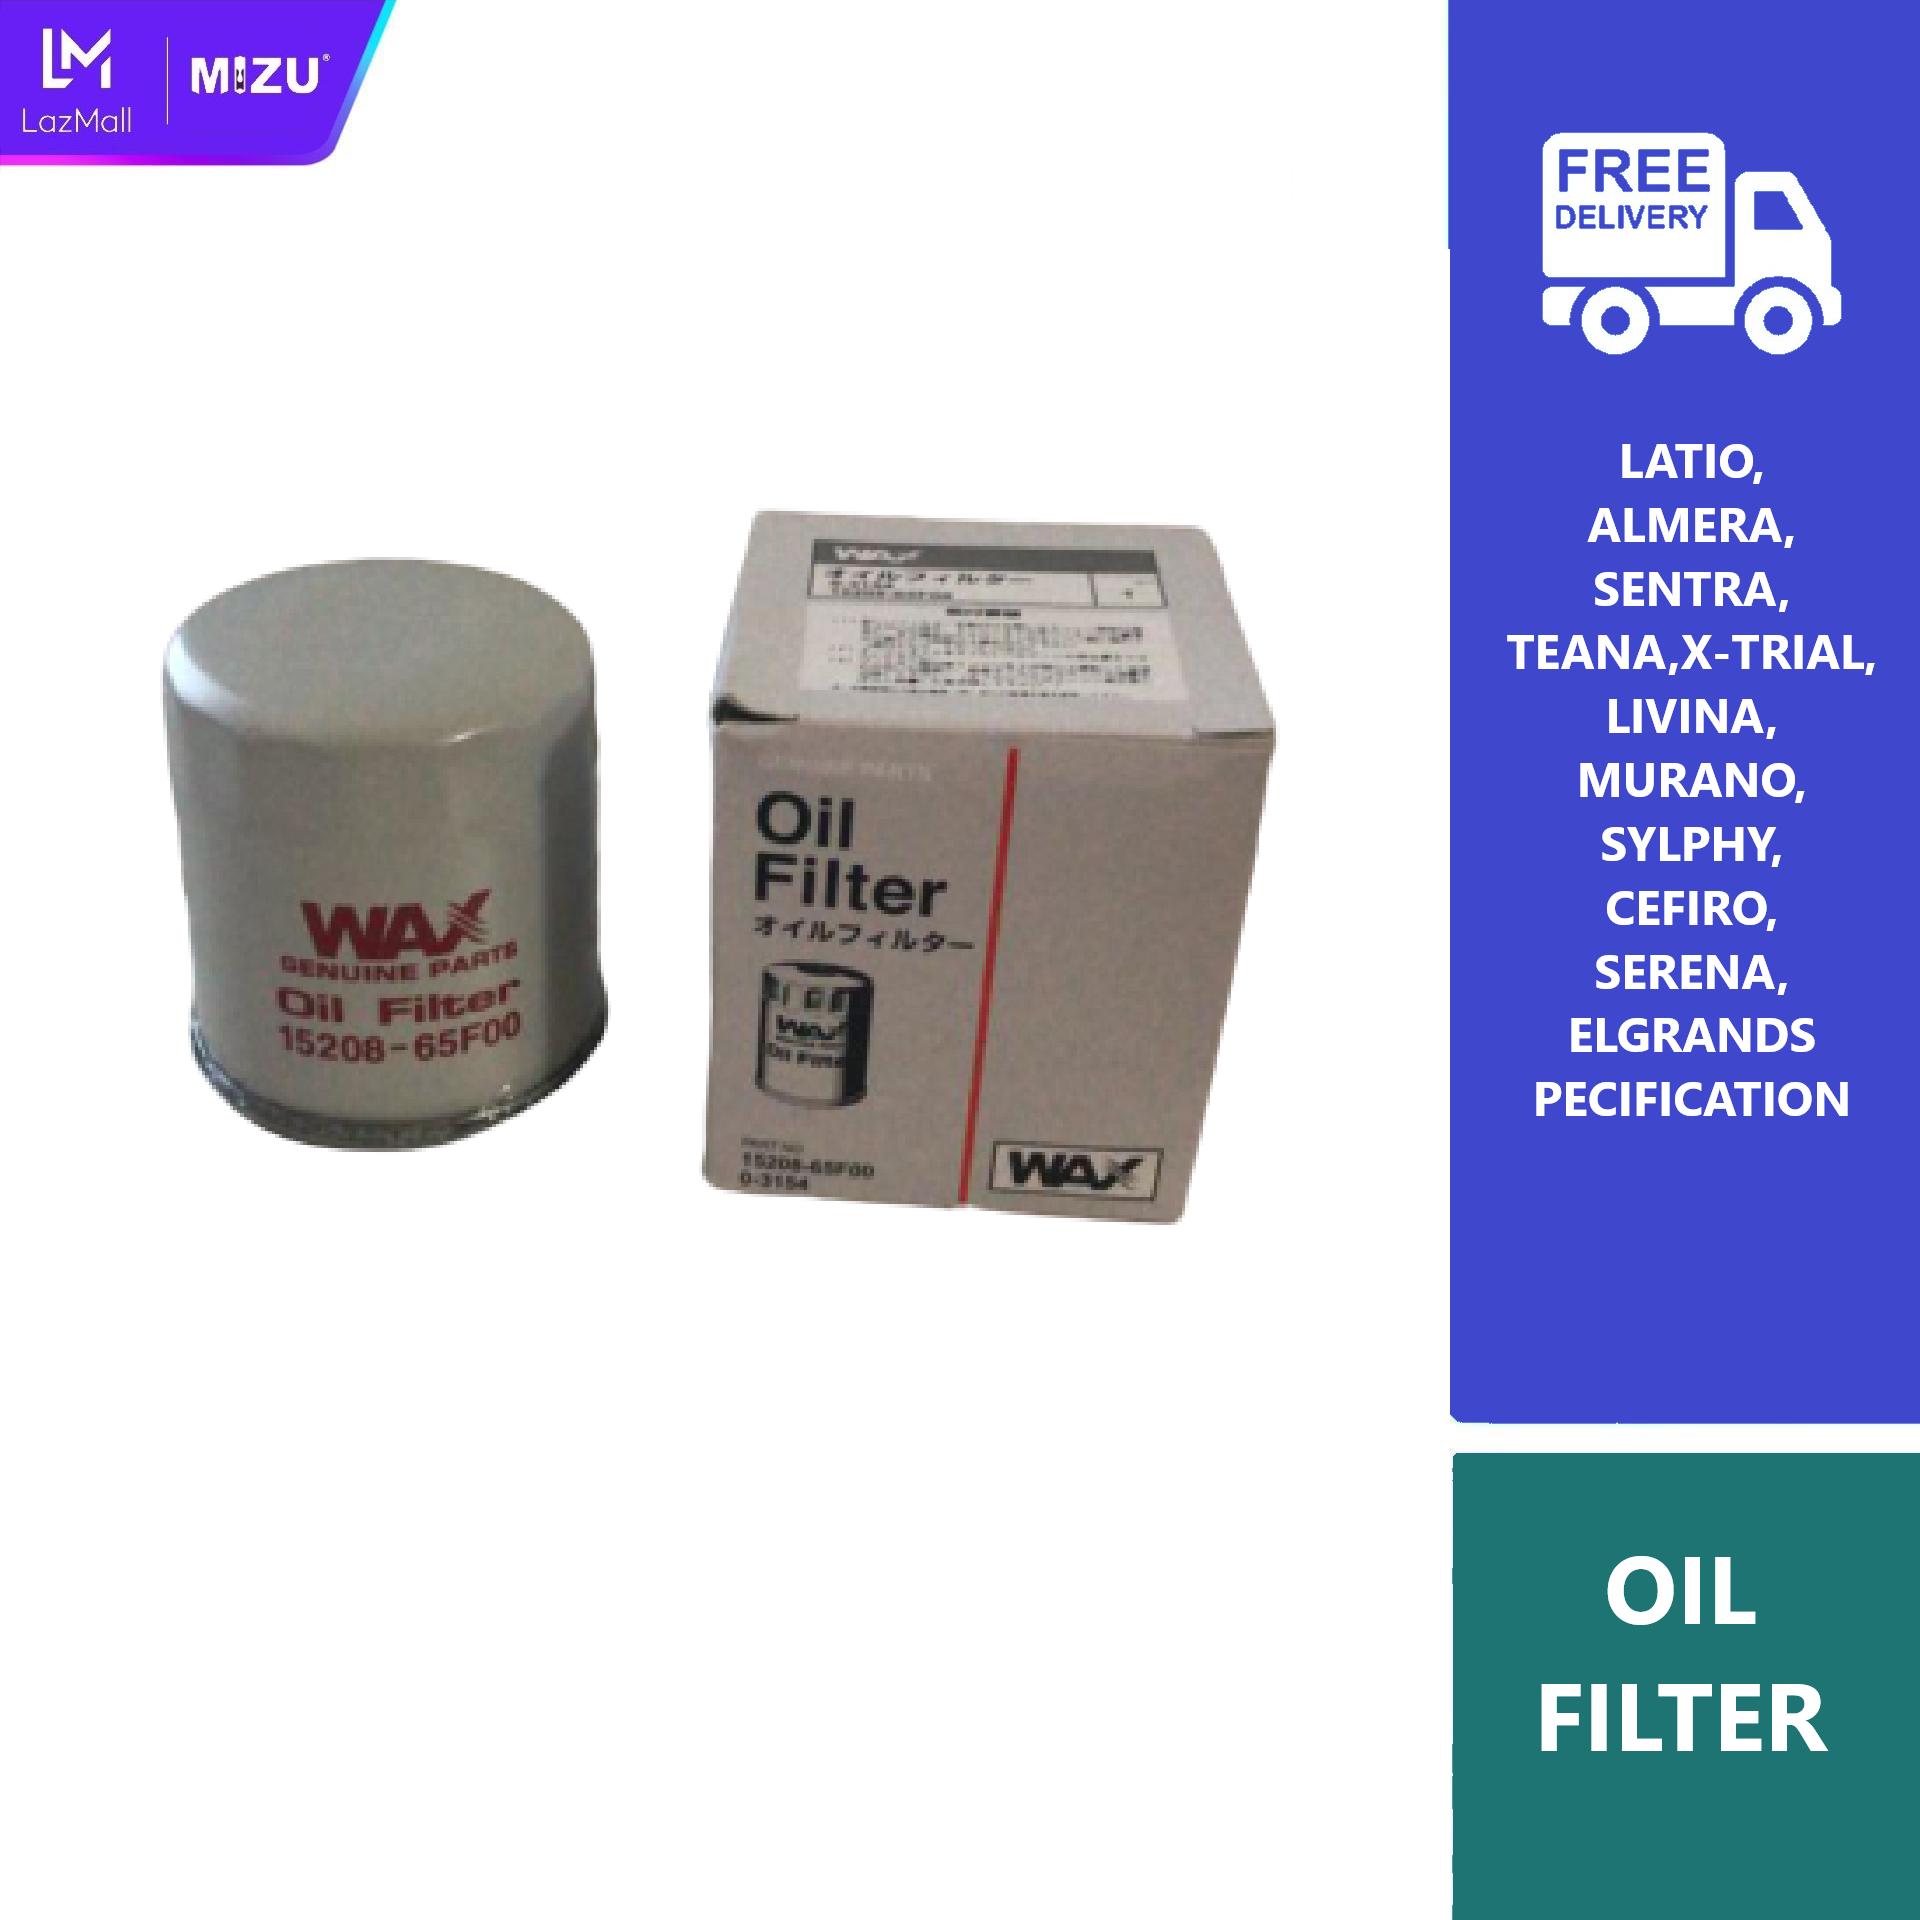 MIZU WAX Genuine NISSAN Oil Filter LIVINA,LATIO, SLYPHY, ALMERA, TEANA, XTRAIL 15208-65F00 Oil Filter DIY car accessories car minyak hitam 5w30 5w40 10w40 minyak injin engine oil 10w30 15w40 20w50